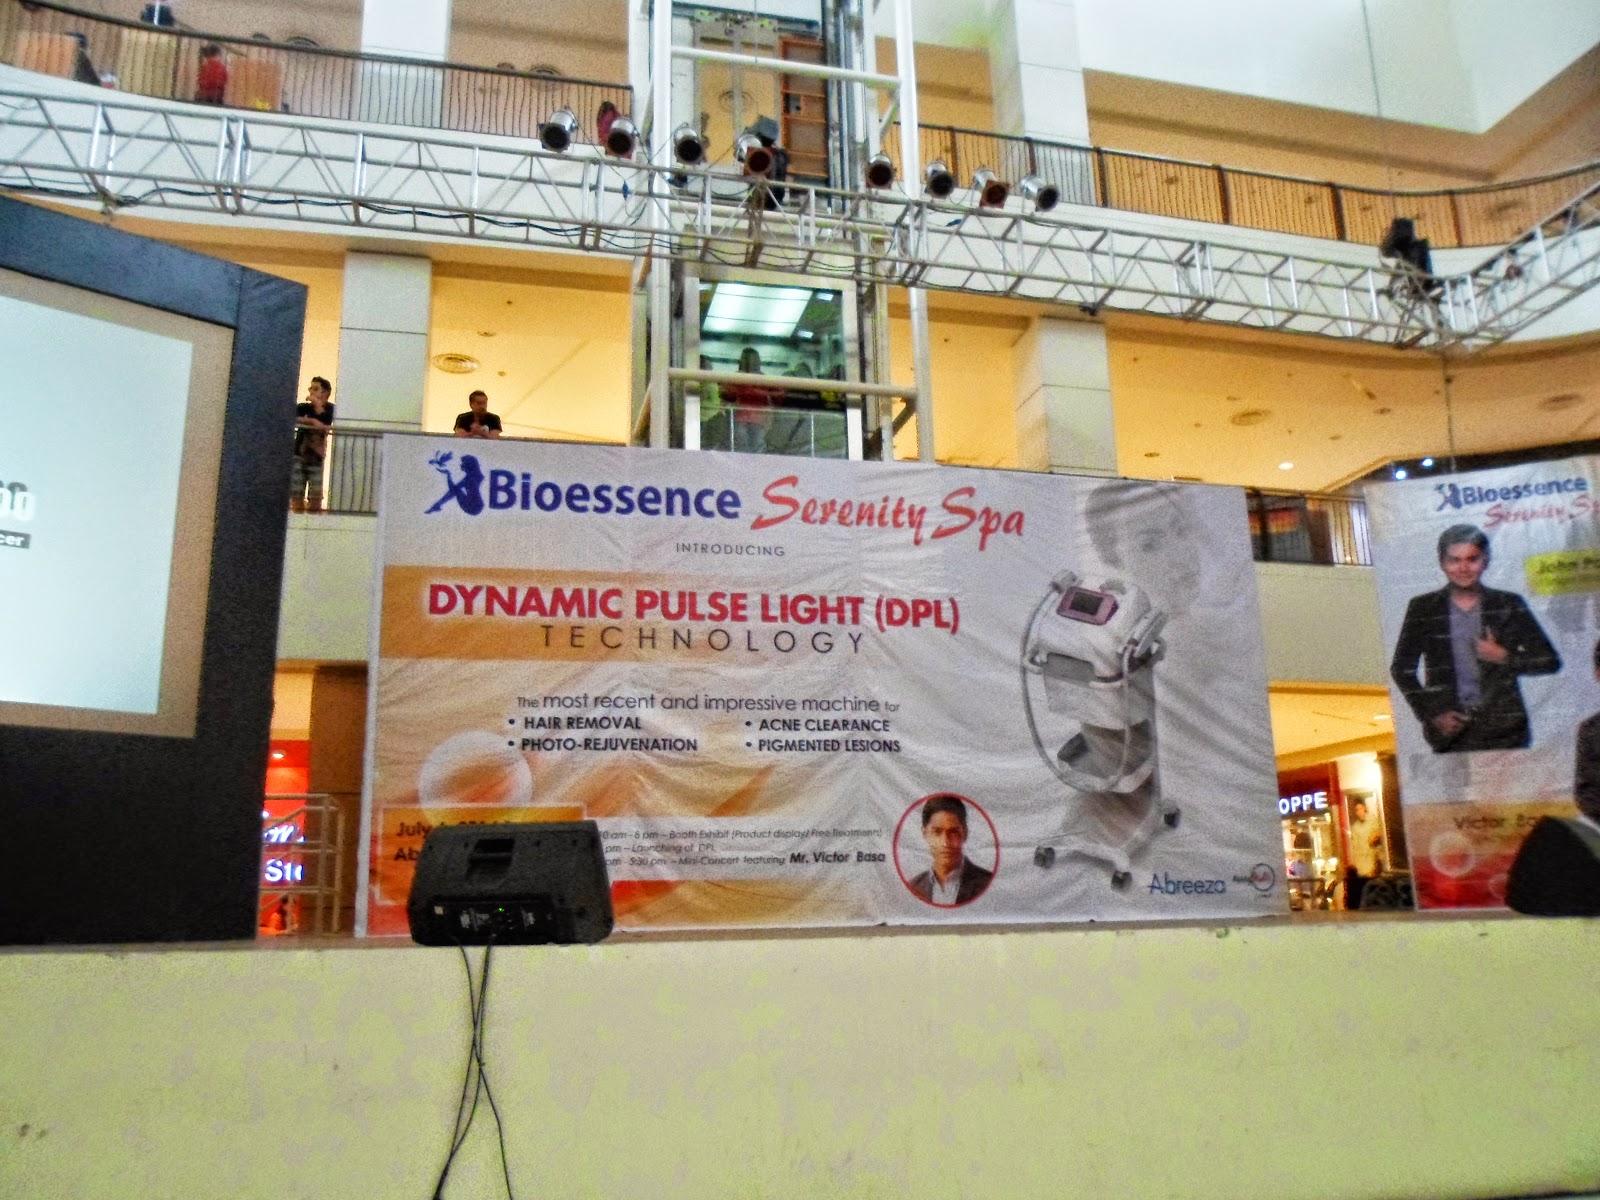 Bioessence DPL (Dynamic Pulse Light) Technology Launch at Abreeza, Davao